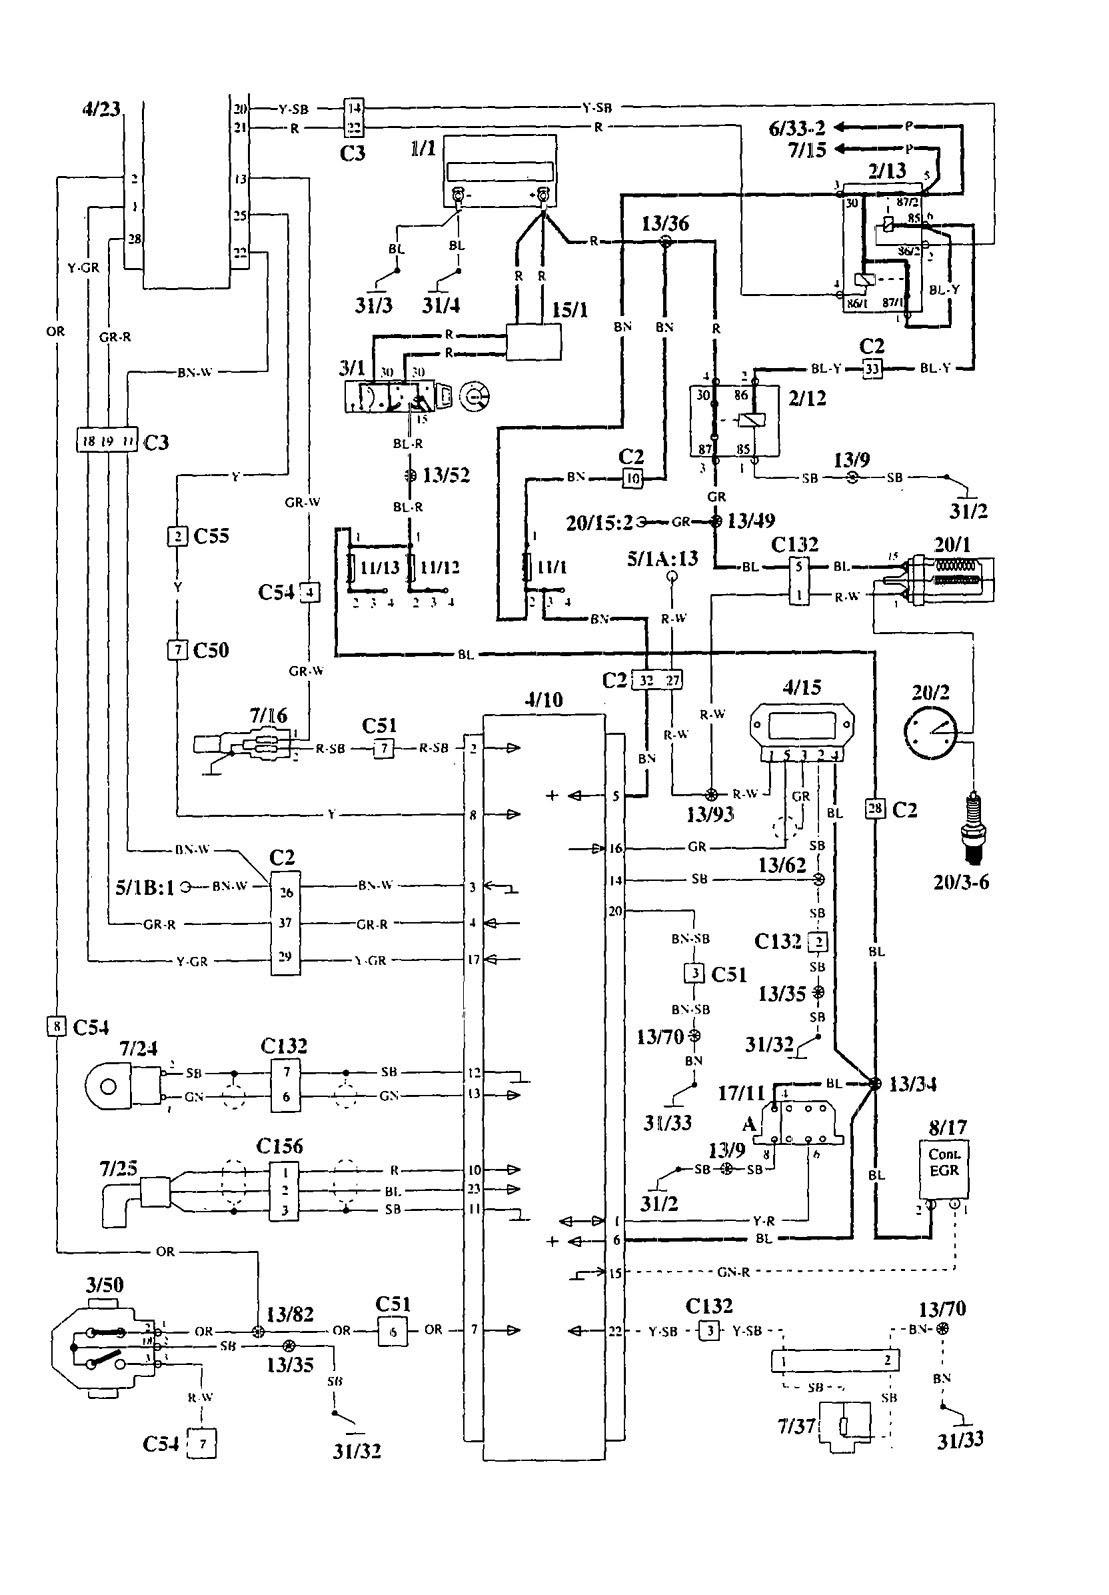 Diagram 2010 Volvo Wiring Diagram Full Version Hd Quality Wiring Diagram Diagramsfae Caditwergi It